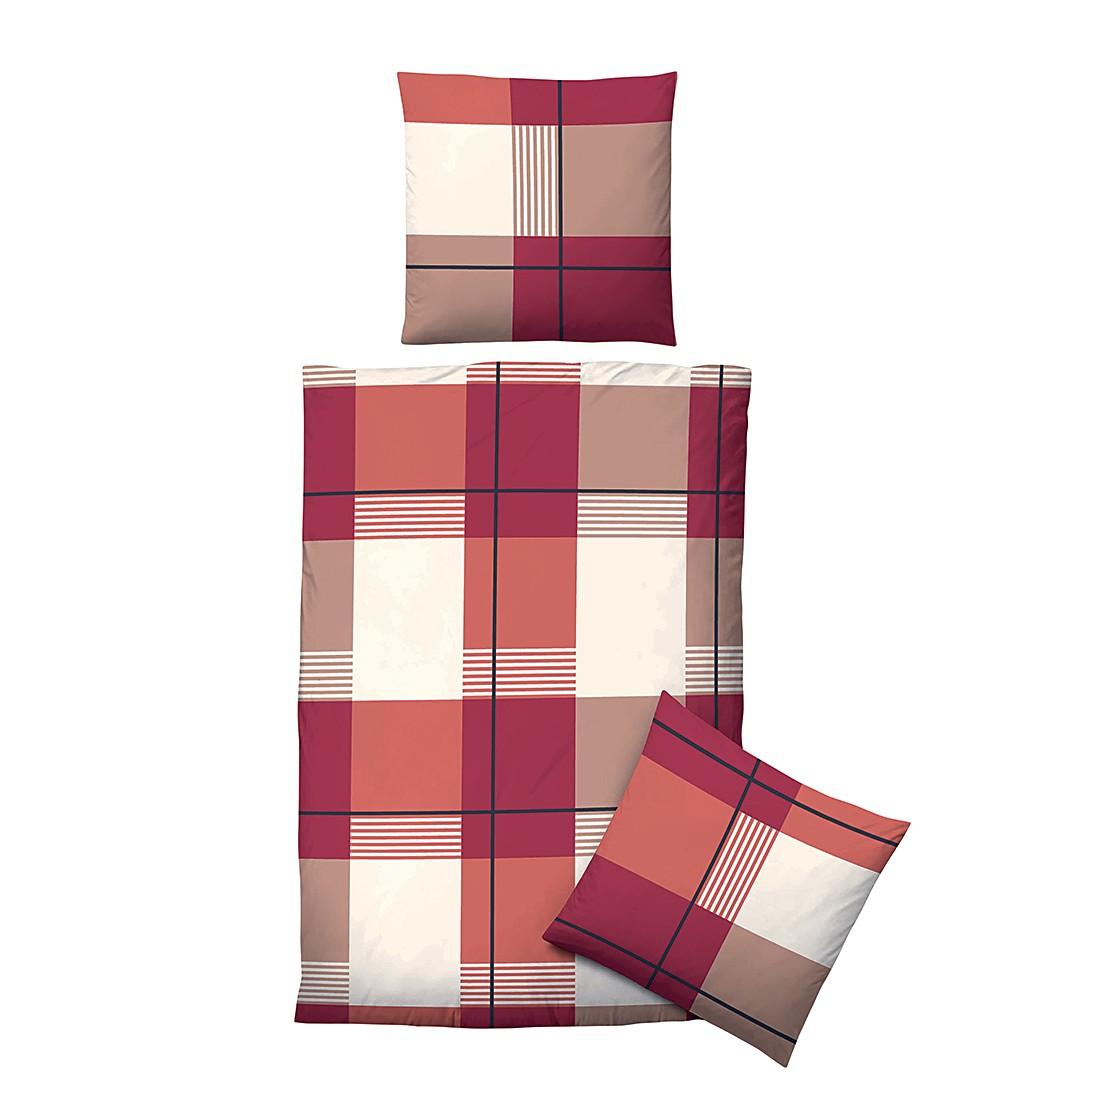 Komfort-Biber-Bettwäsche Susann – Rostbraun – 155 x 220 cm + Kissen 80 x 80 cm, Biberna günstig bestellen